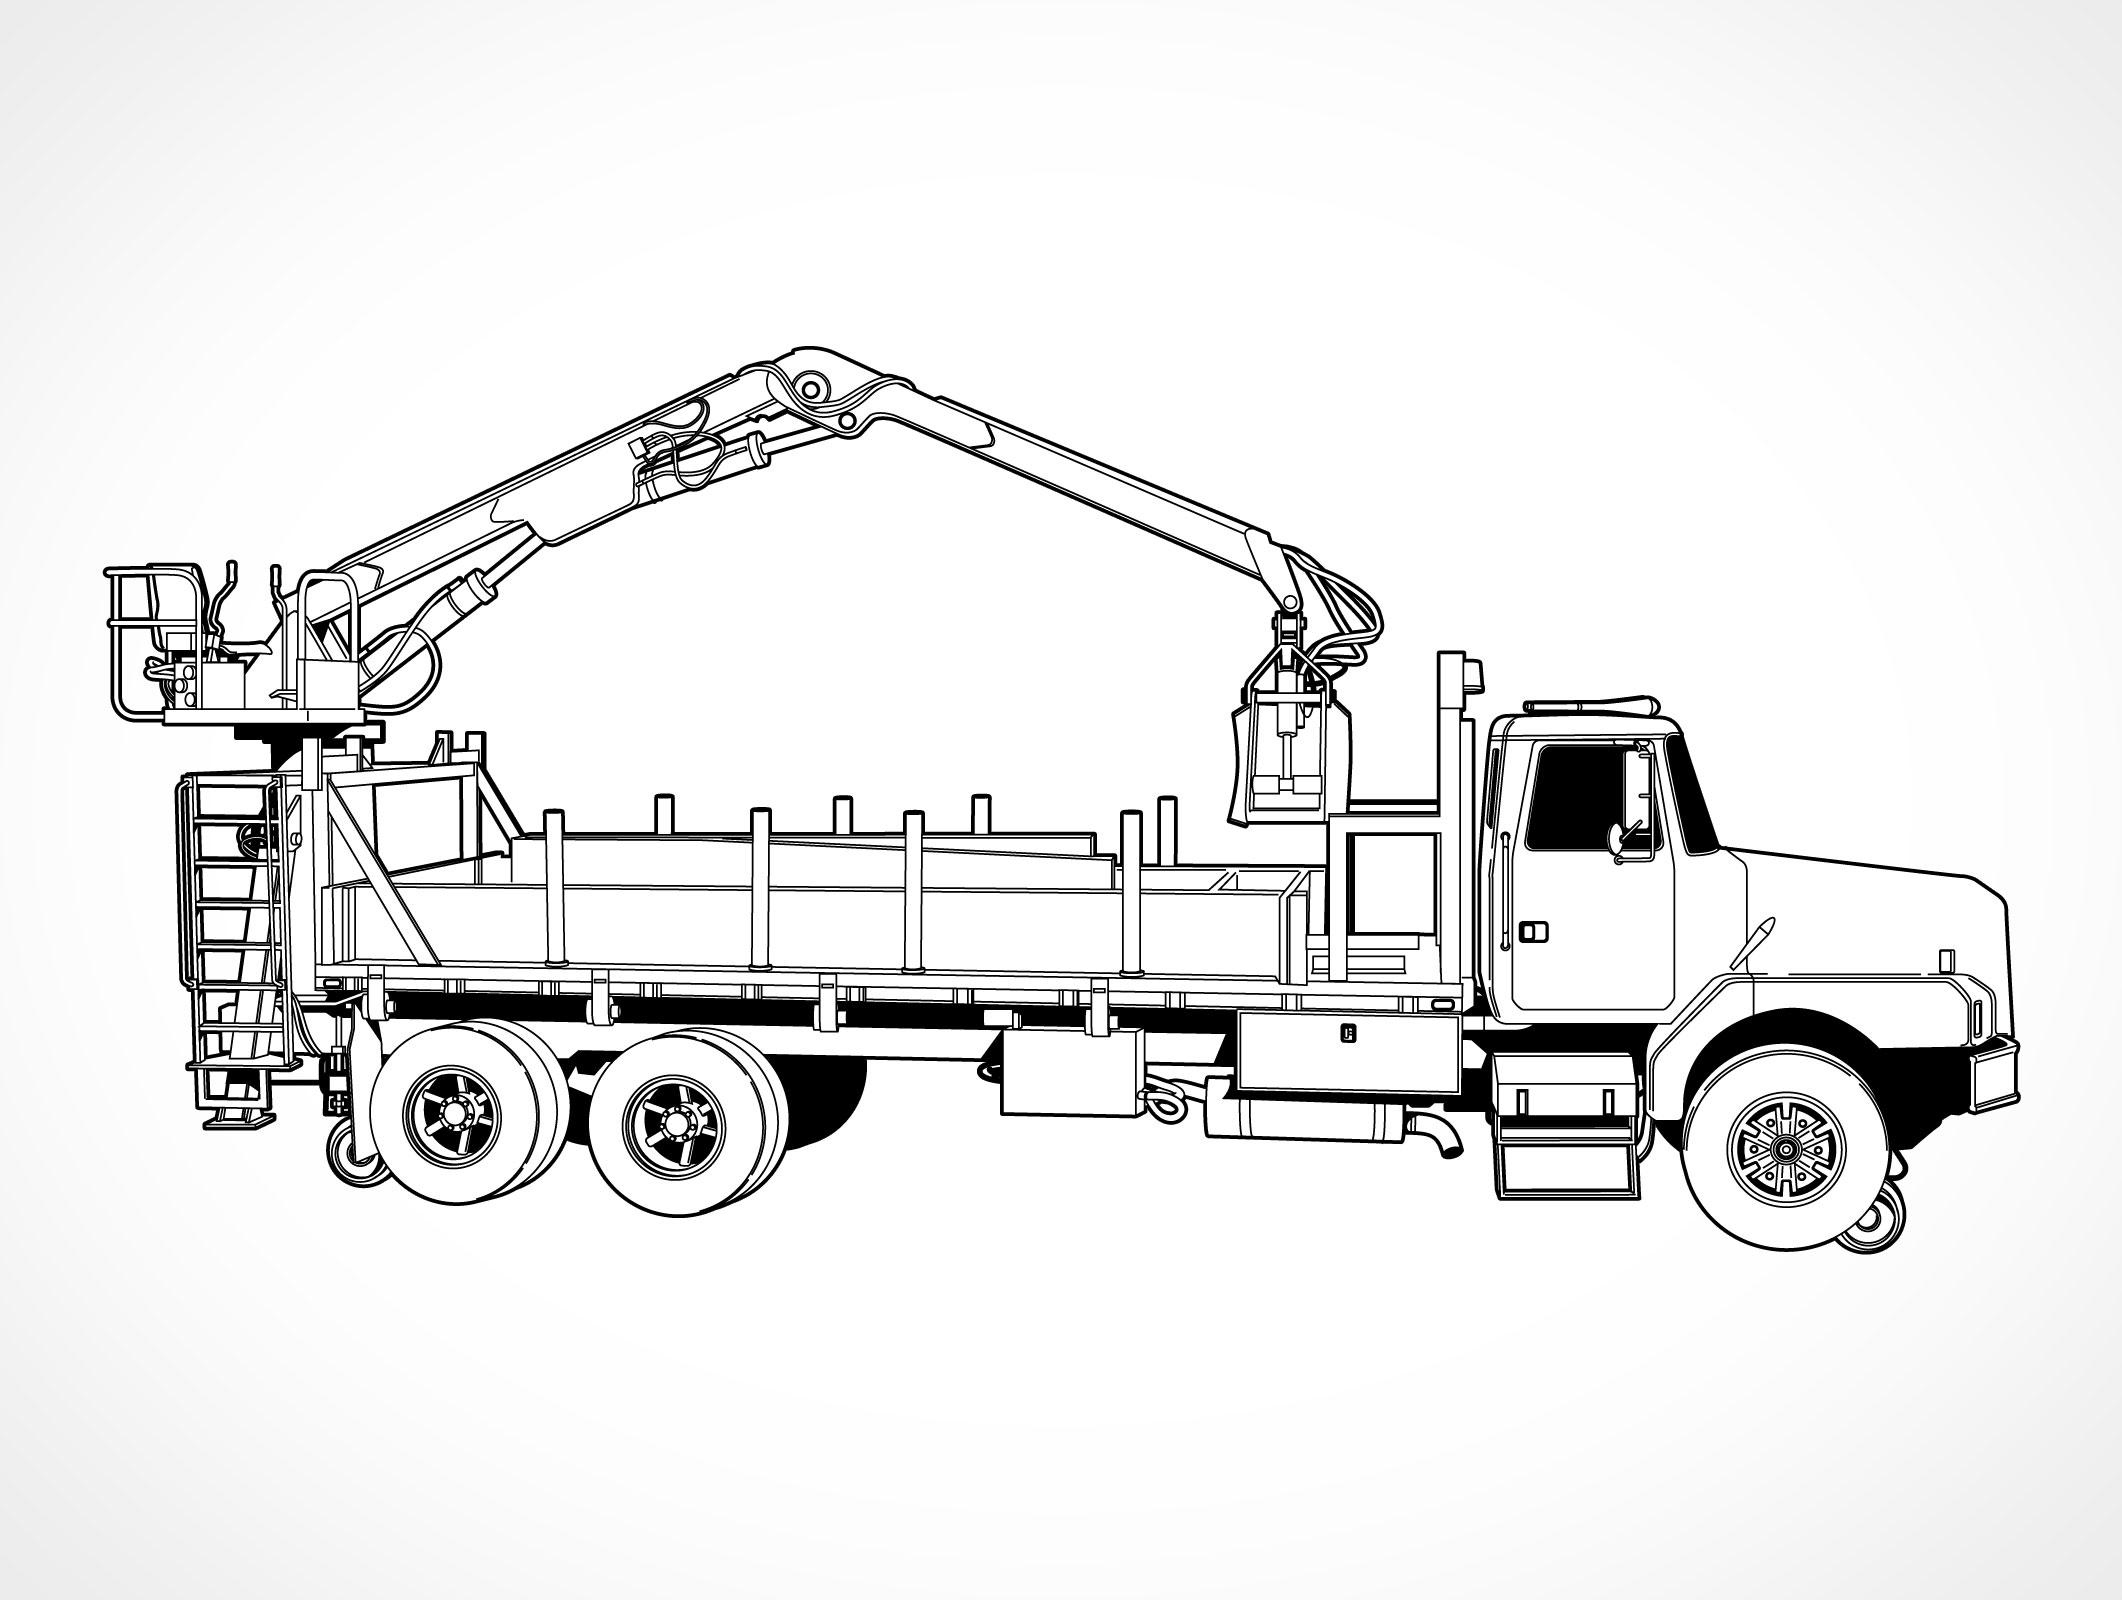 Truck Crane: Utility Truck Crane